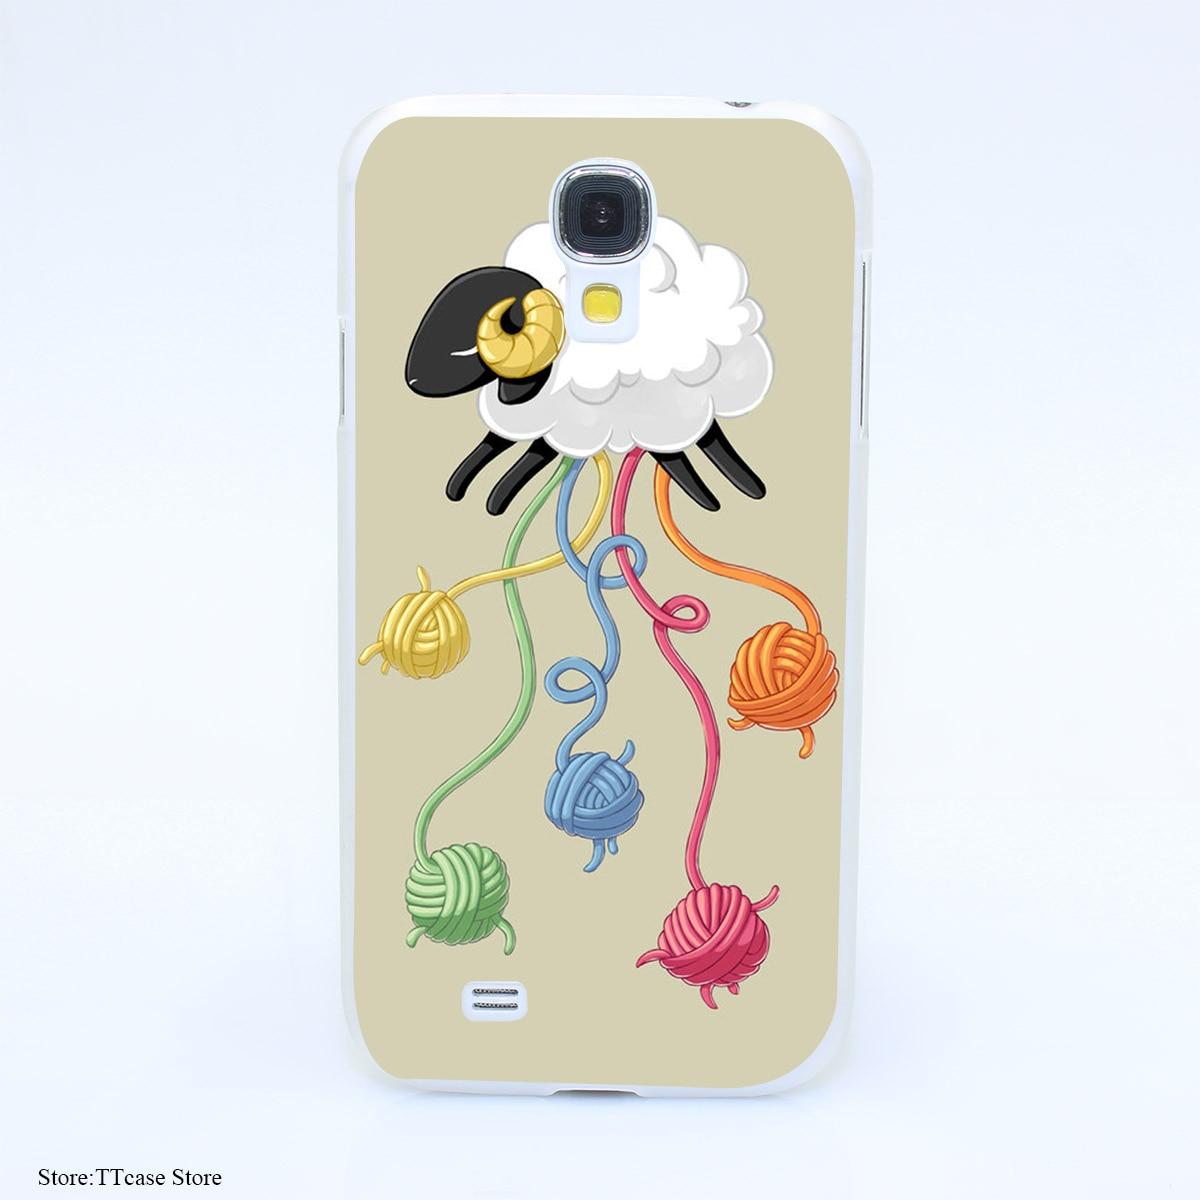 4127CA Wool Thread Hard Transparent Case Cover for Galaxy S2 S3 S4 S5 & Mini S6 S7 & edge Plus